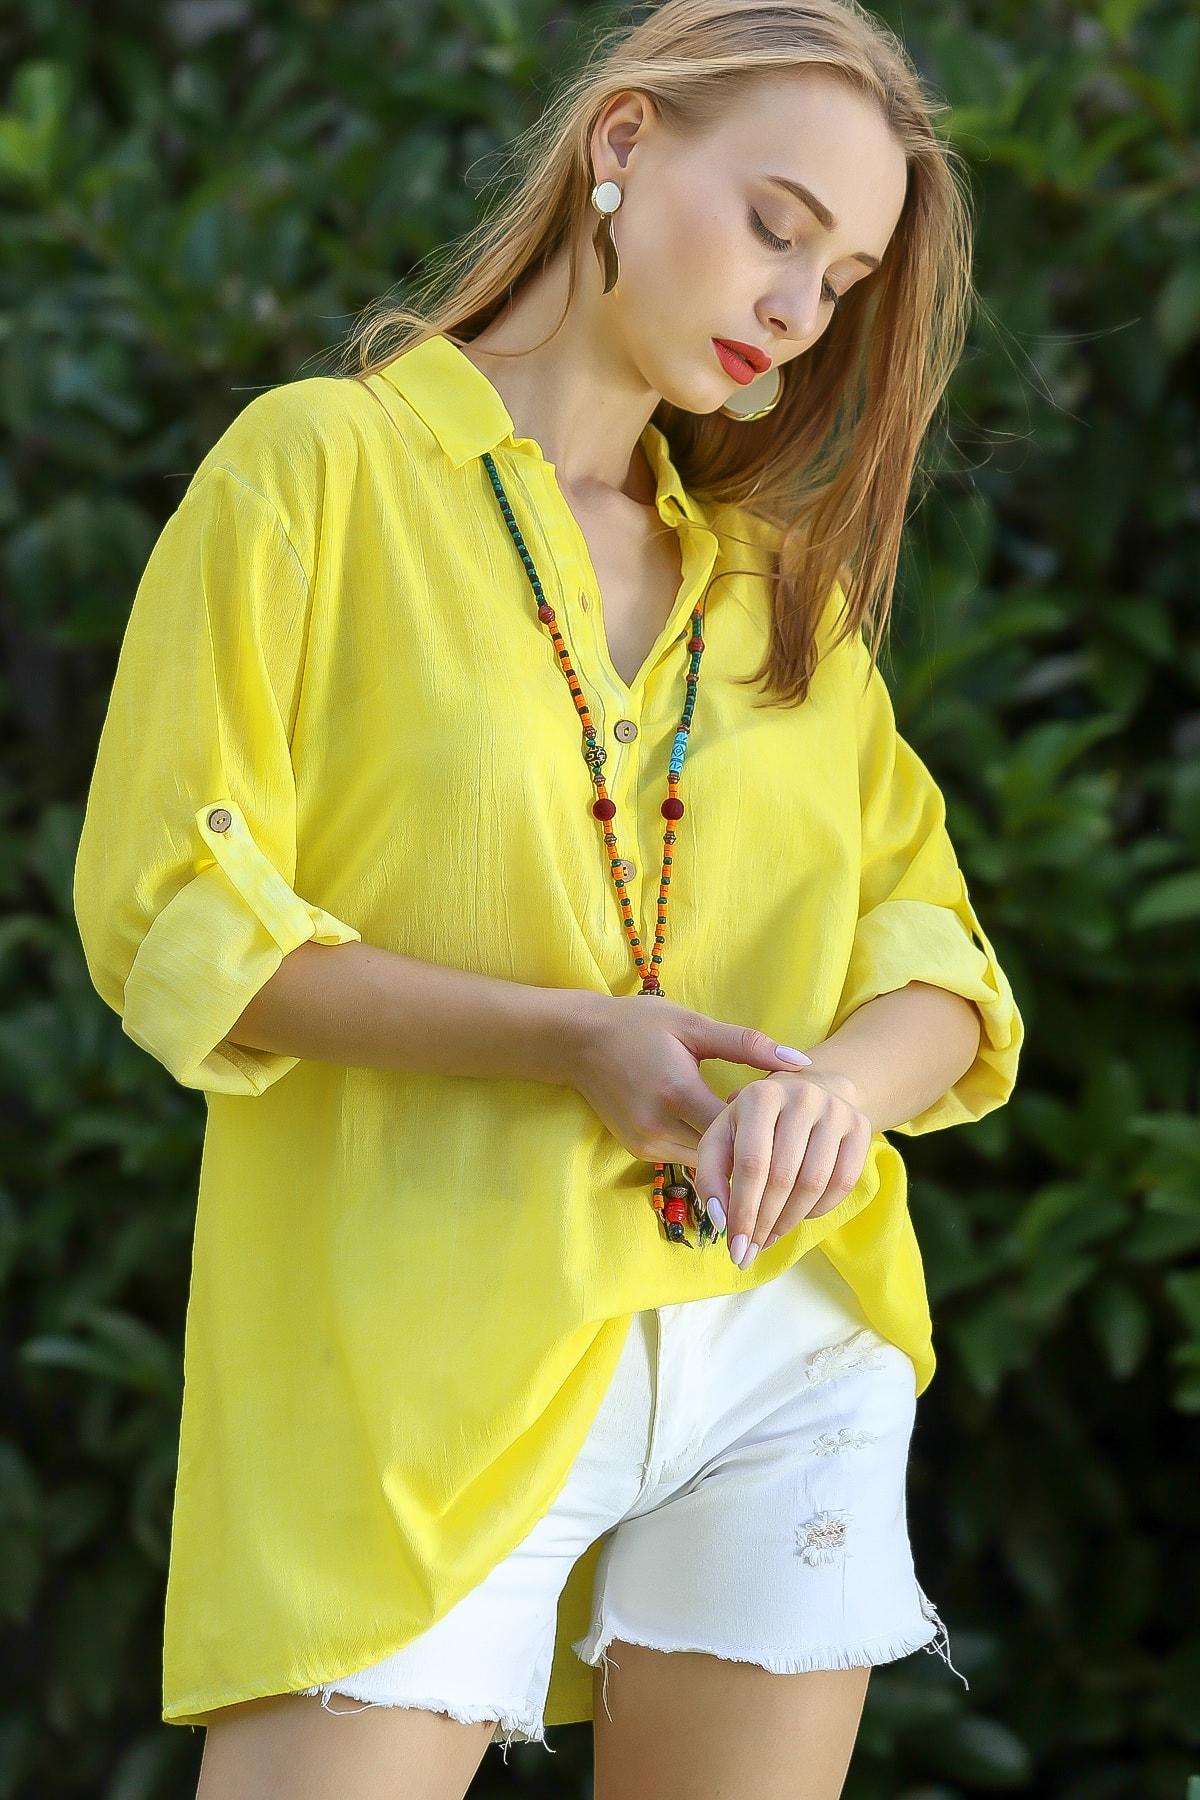 Chiccy Kadın Neon Sarı Casual Gömlek Yaka Pat Detaylı Yıkamalı Tunik Bluz M10010200Bl96076 1